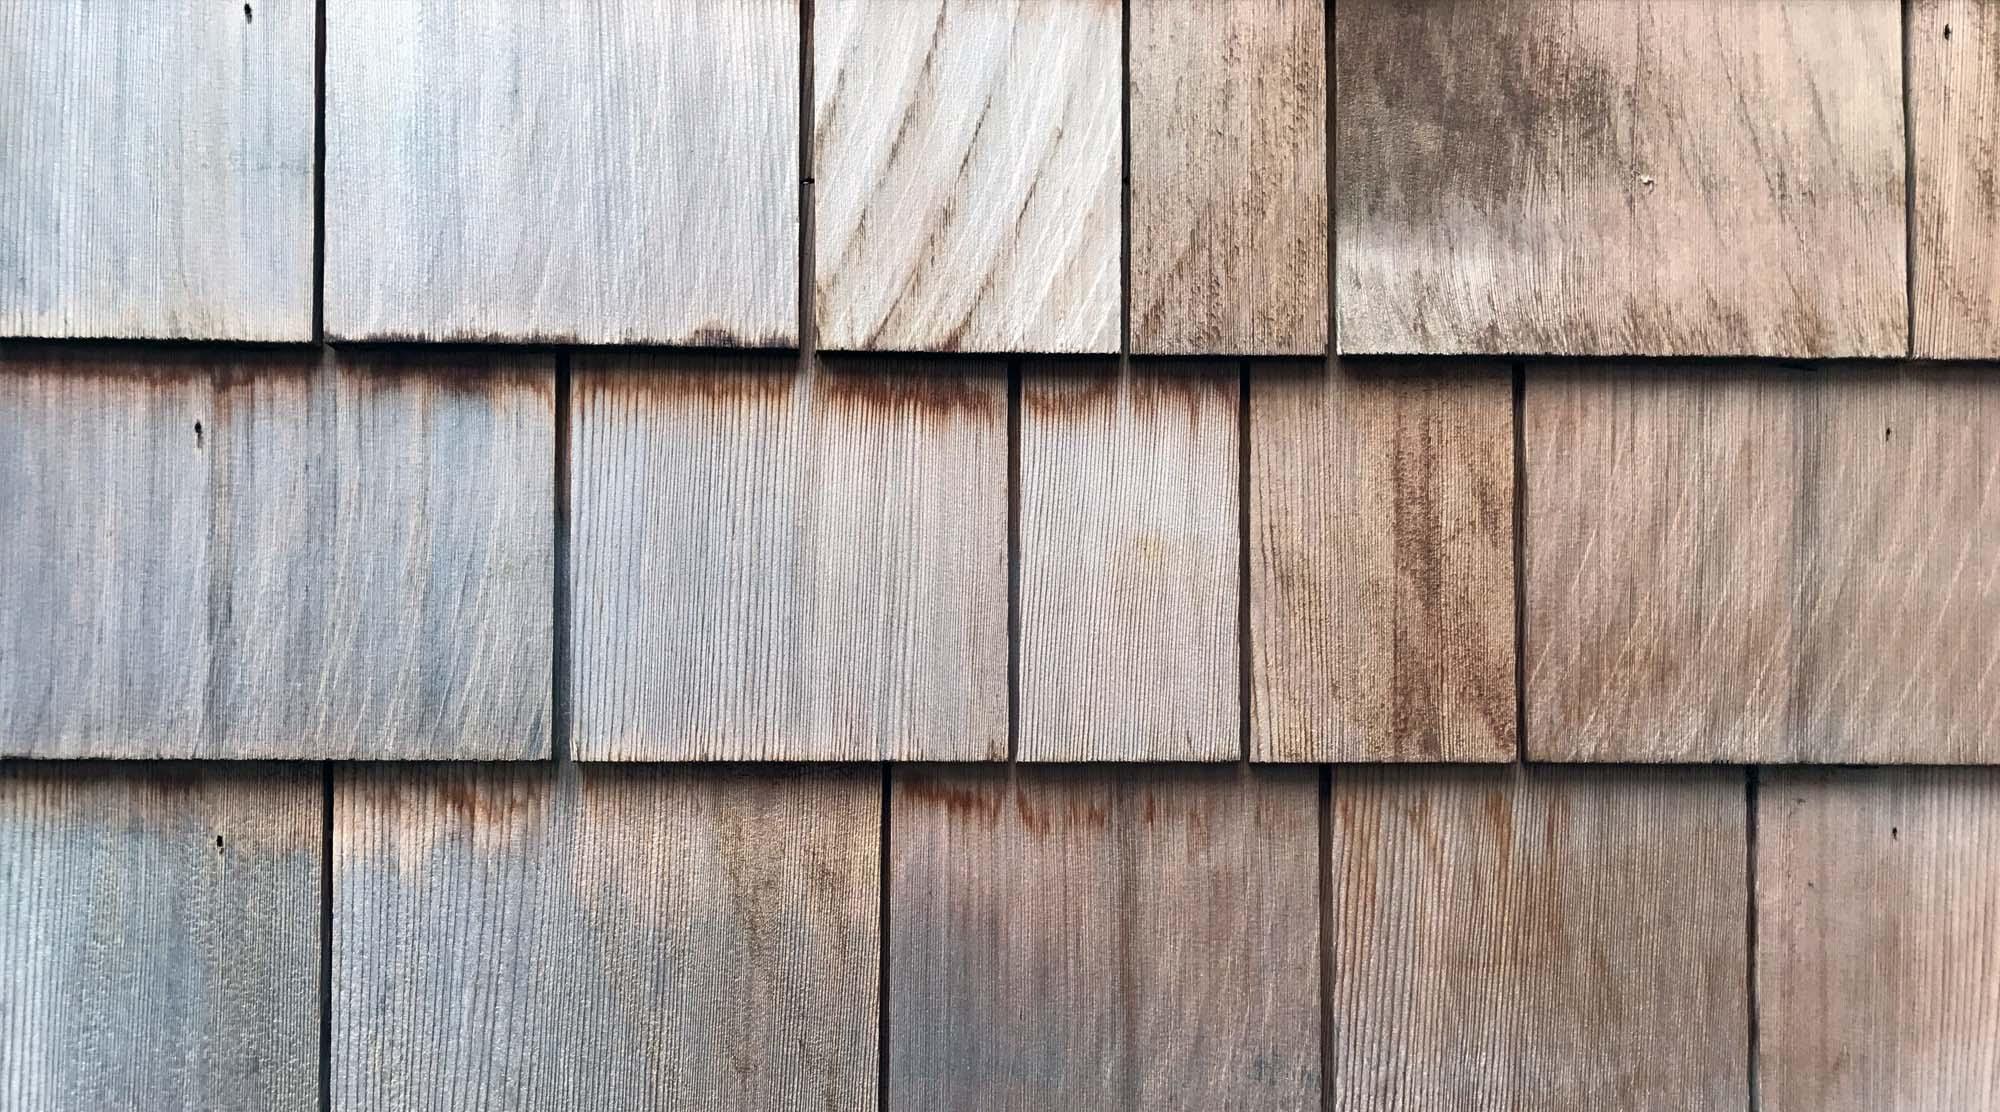 cedar shingle siding close up